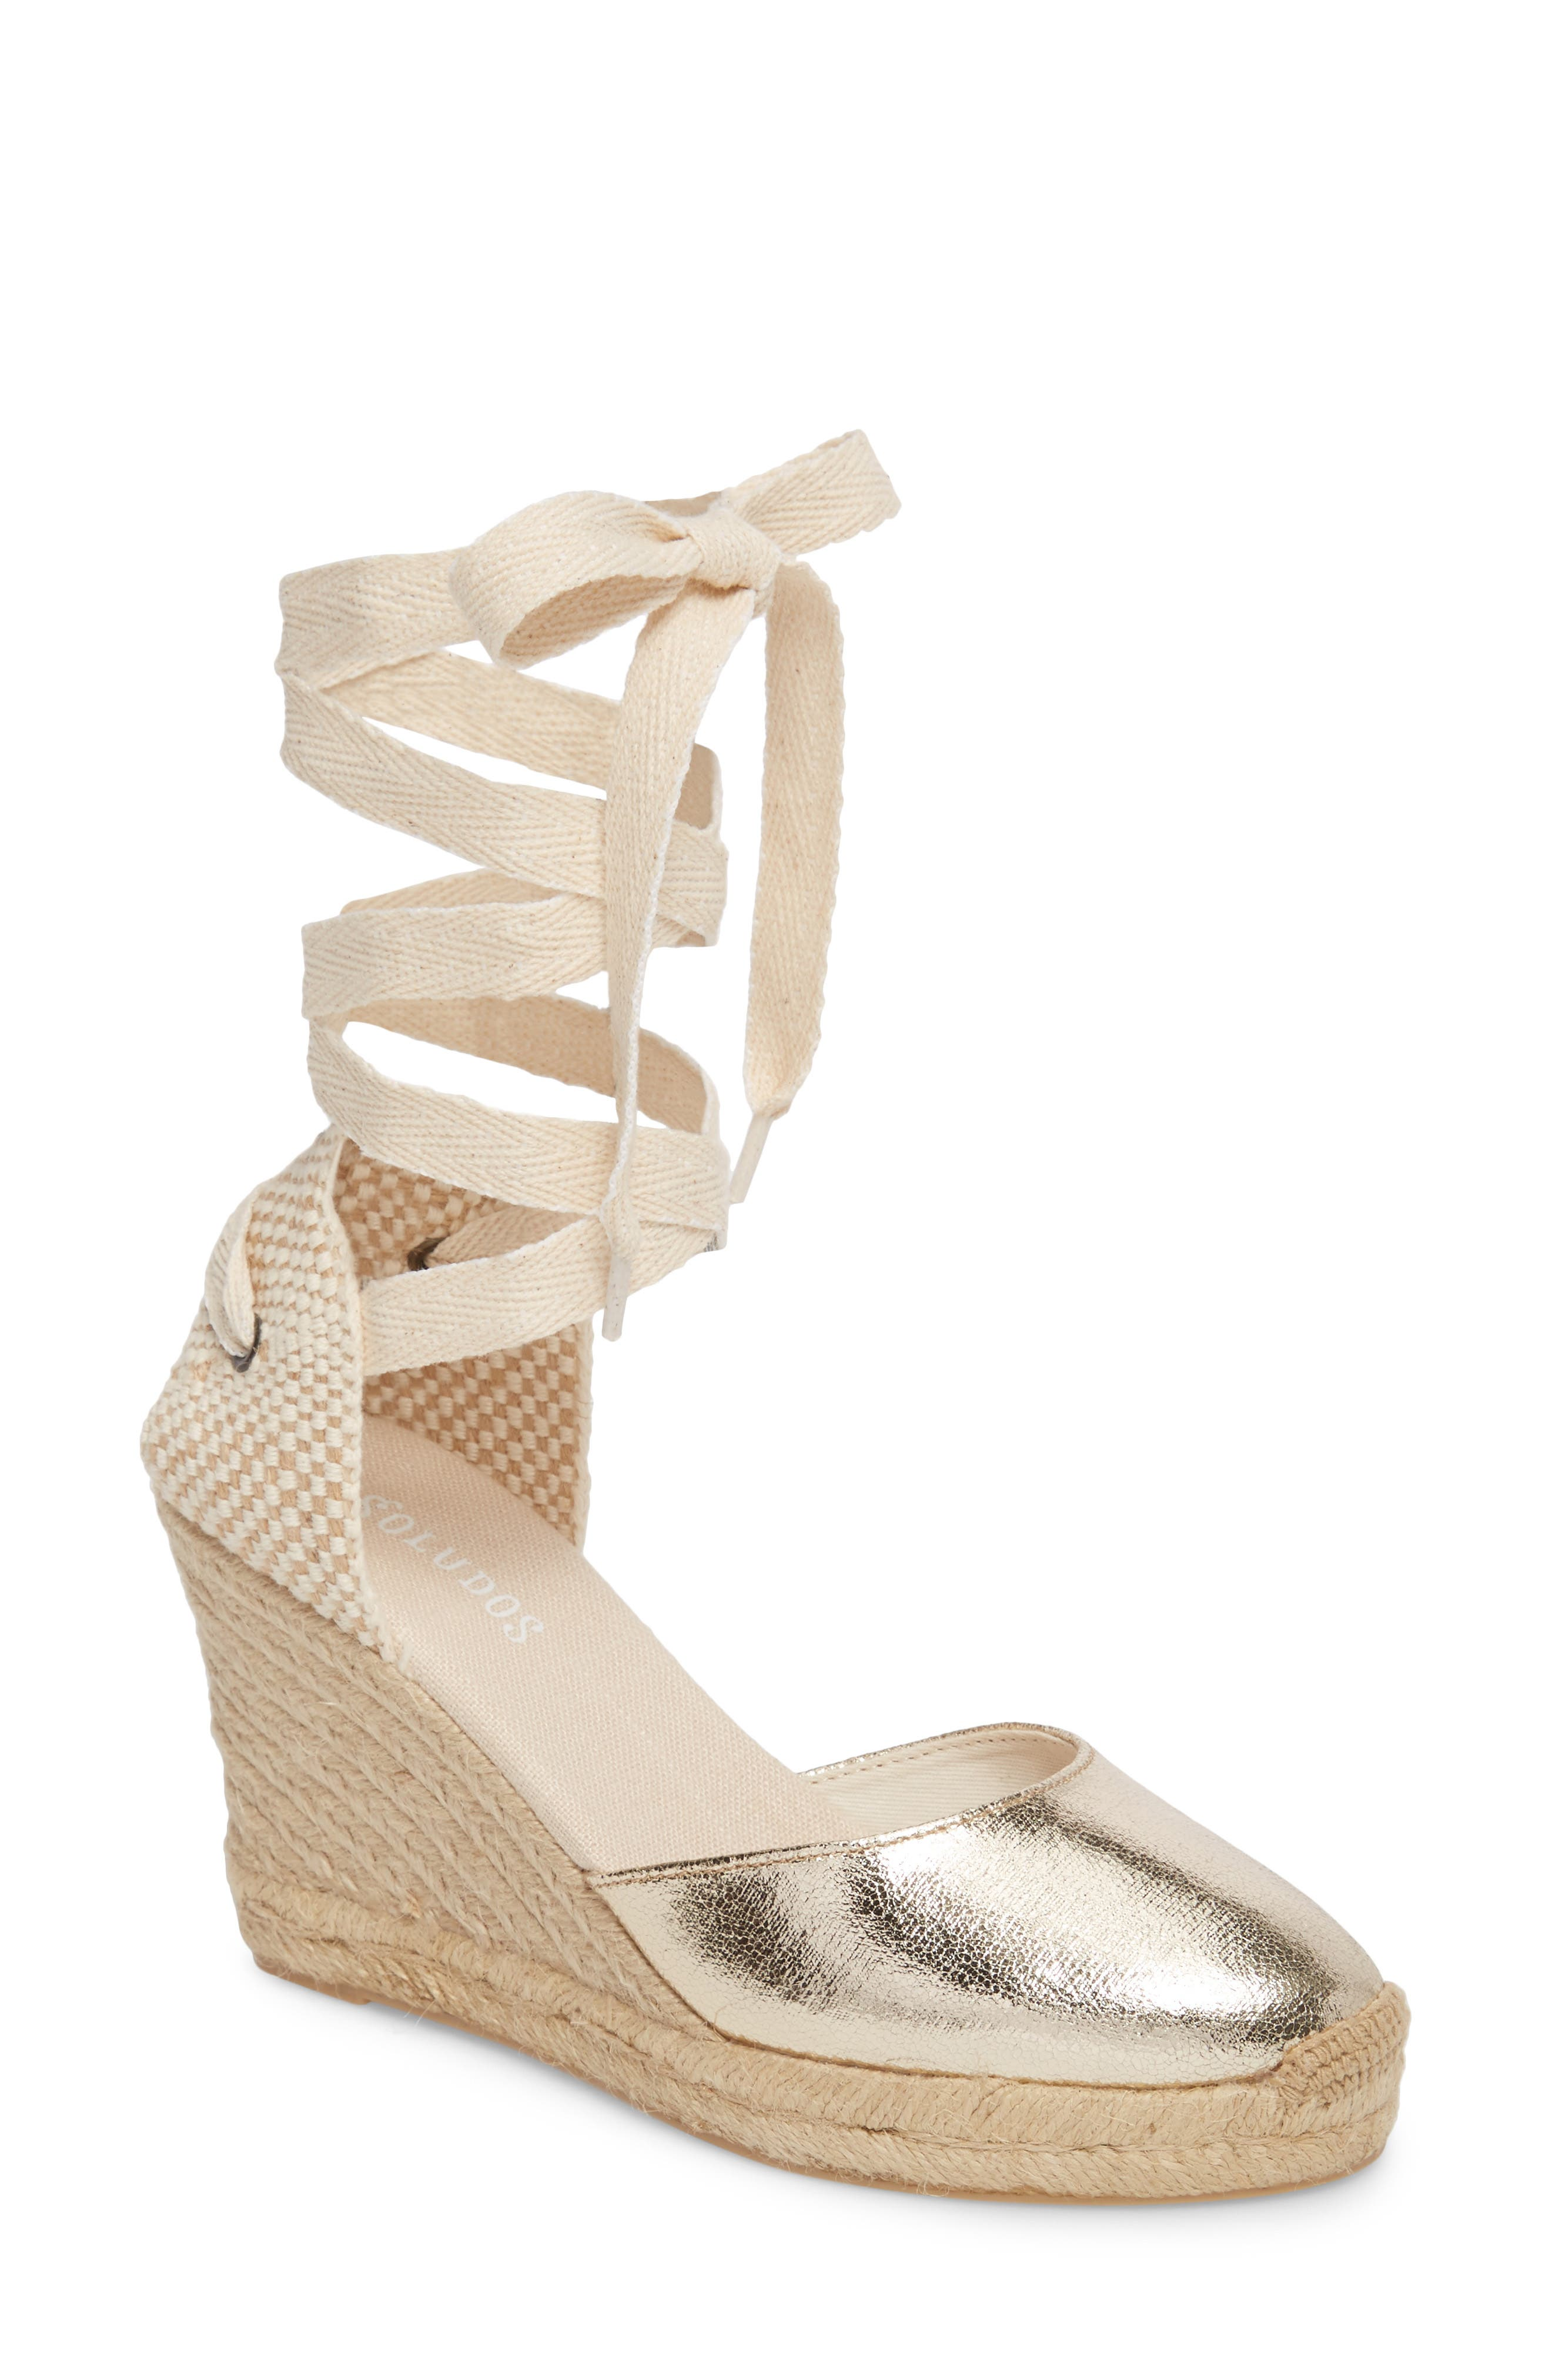 Main Image - Soludos Wedge Lace-Up Espadrille Sandal (Women)